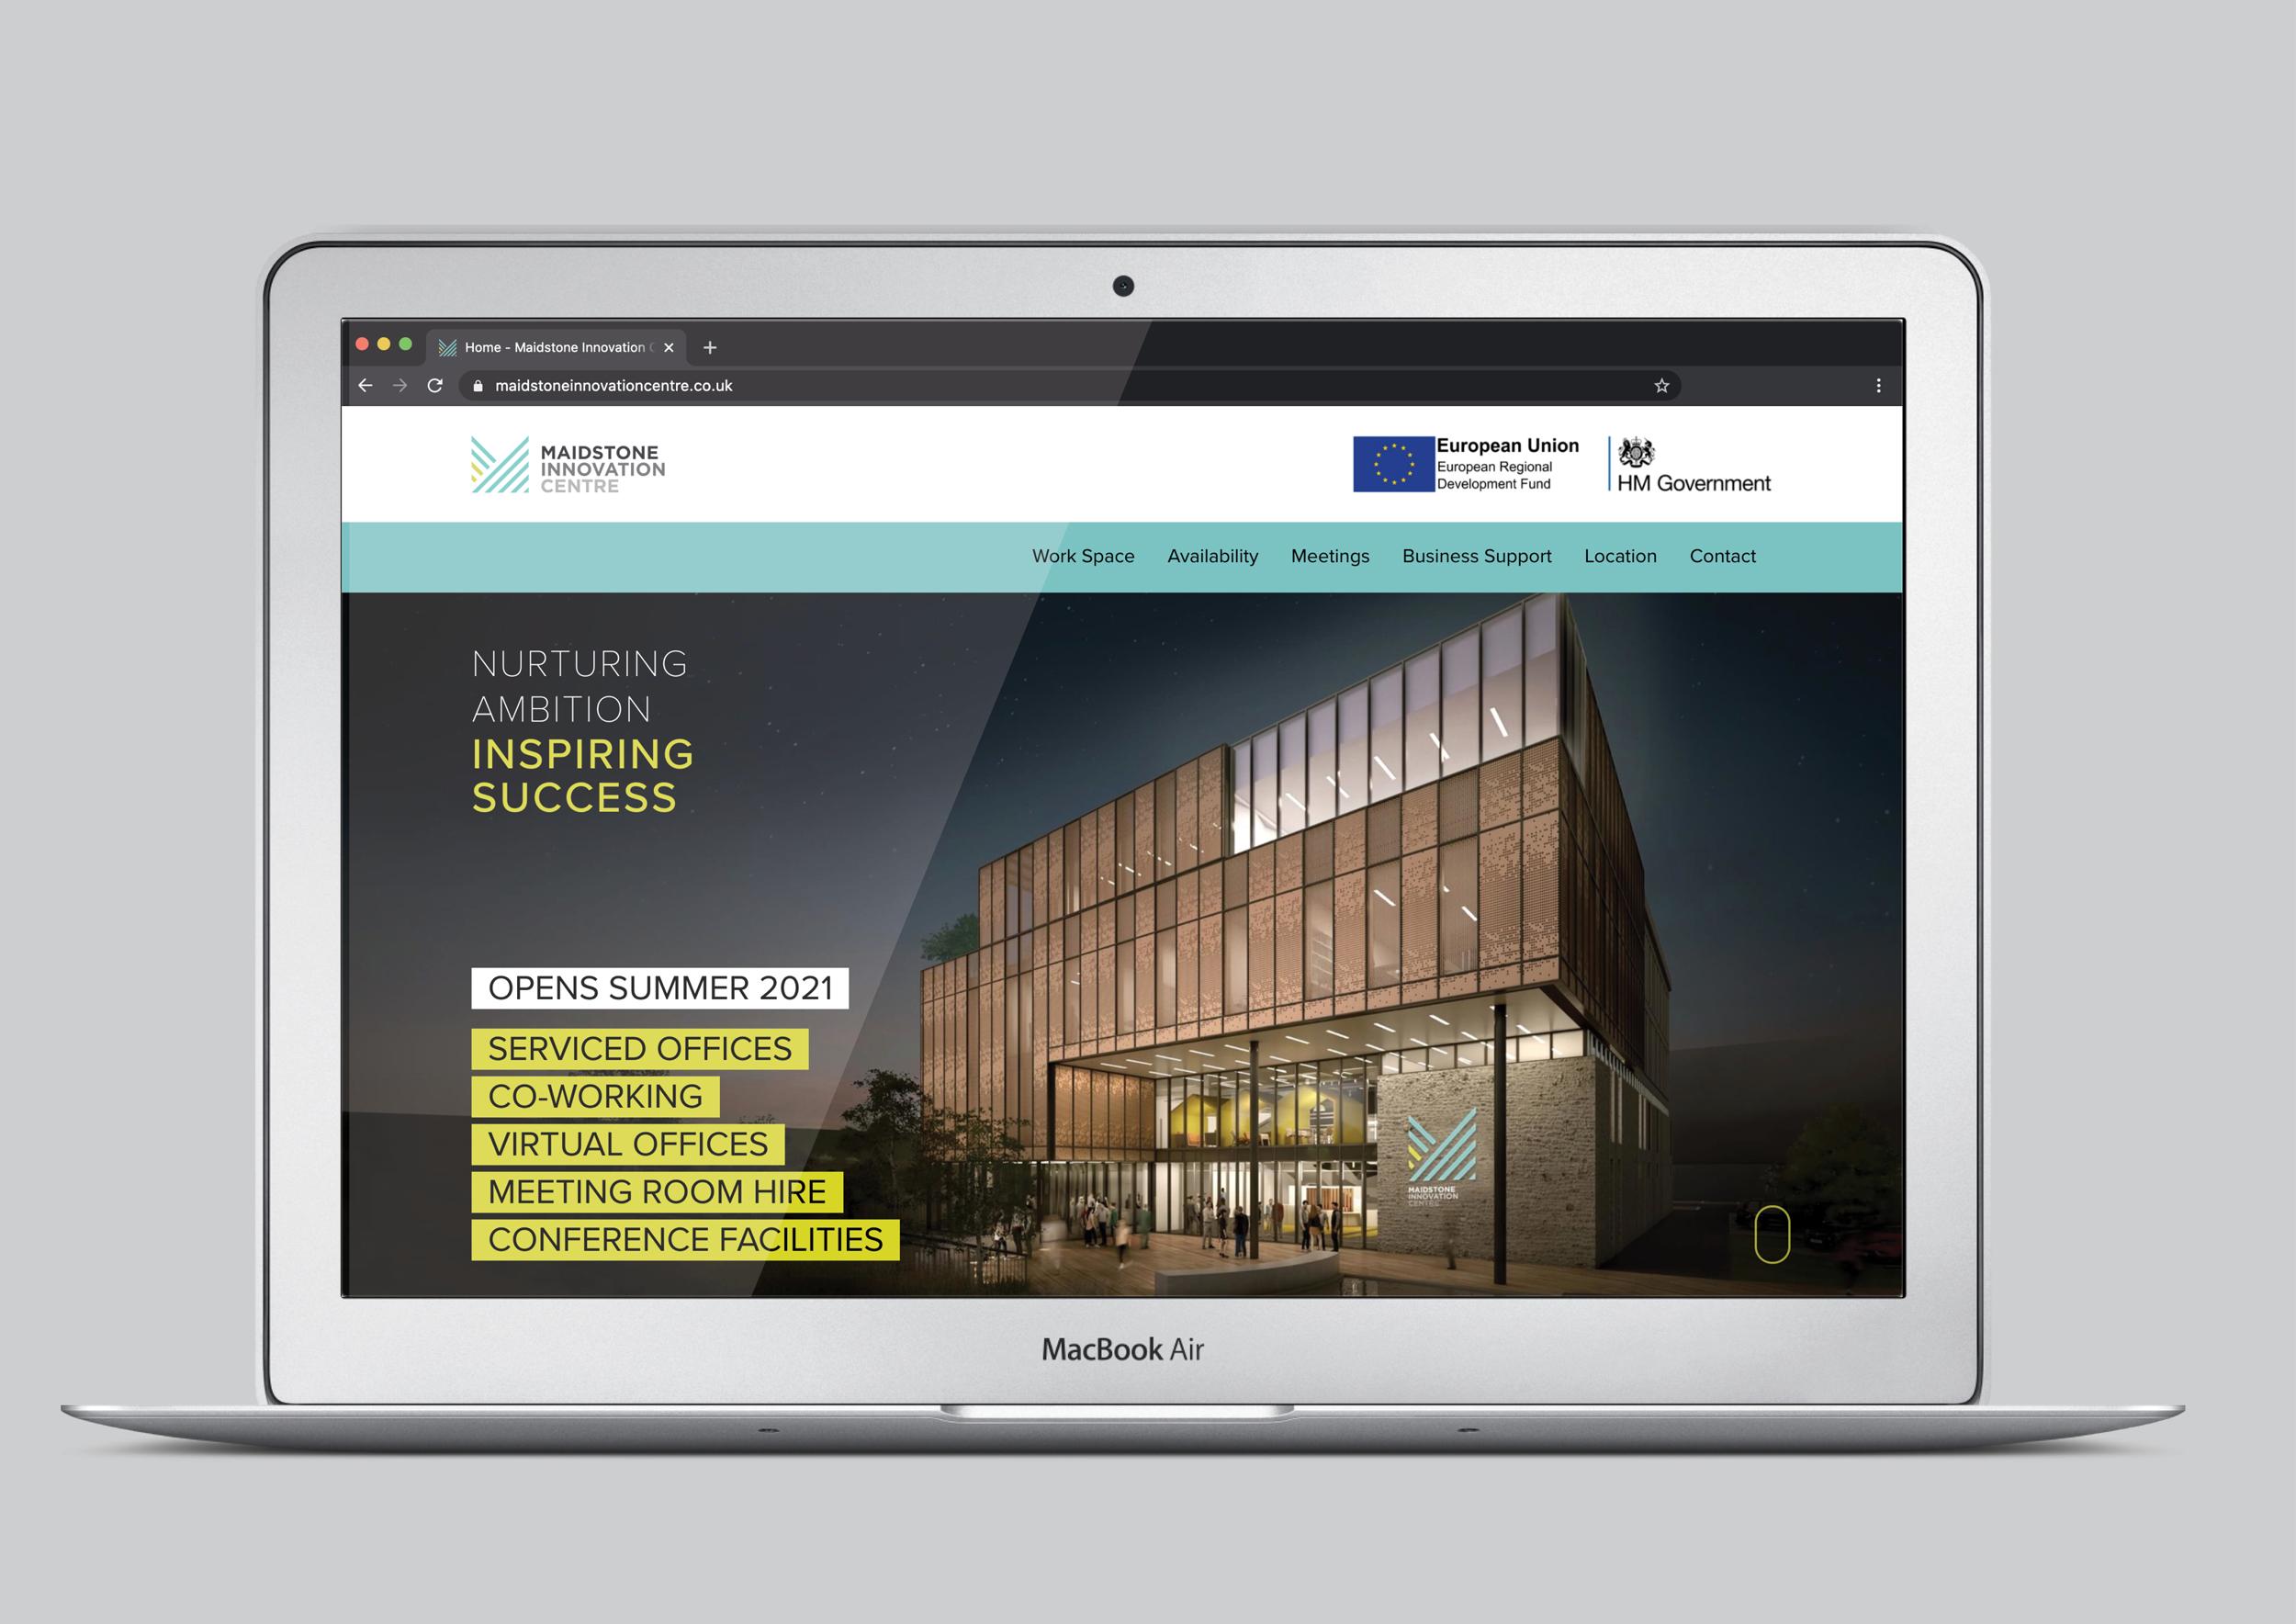 Maidstone website